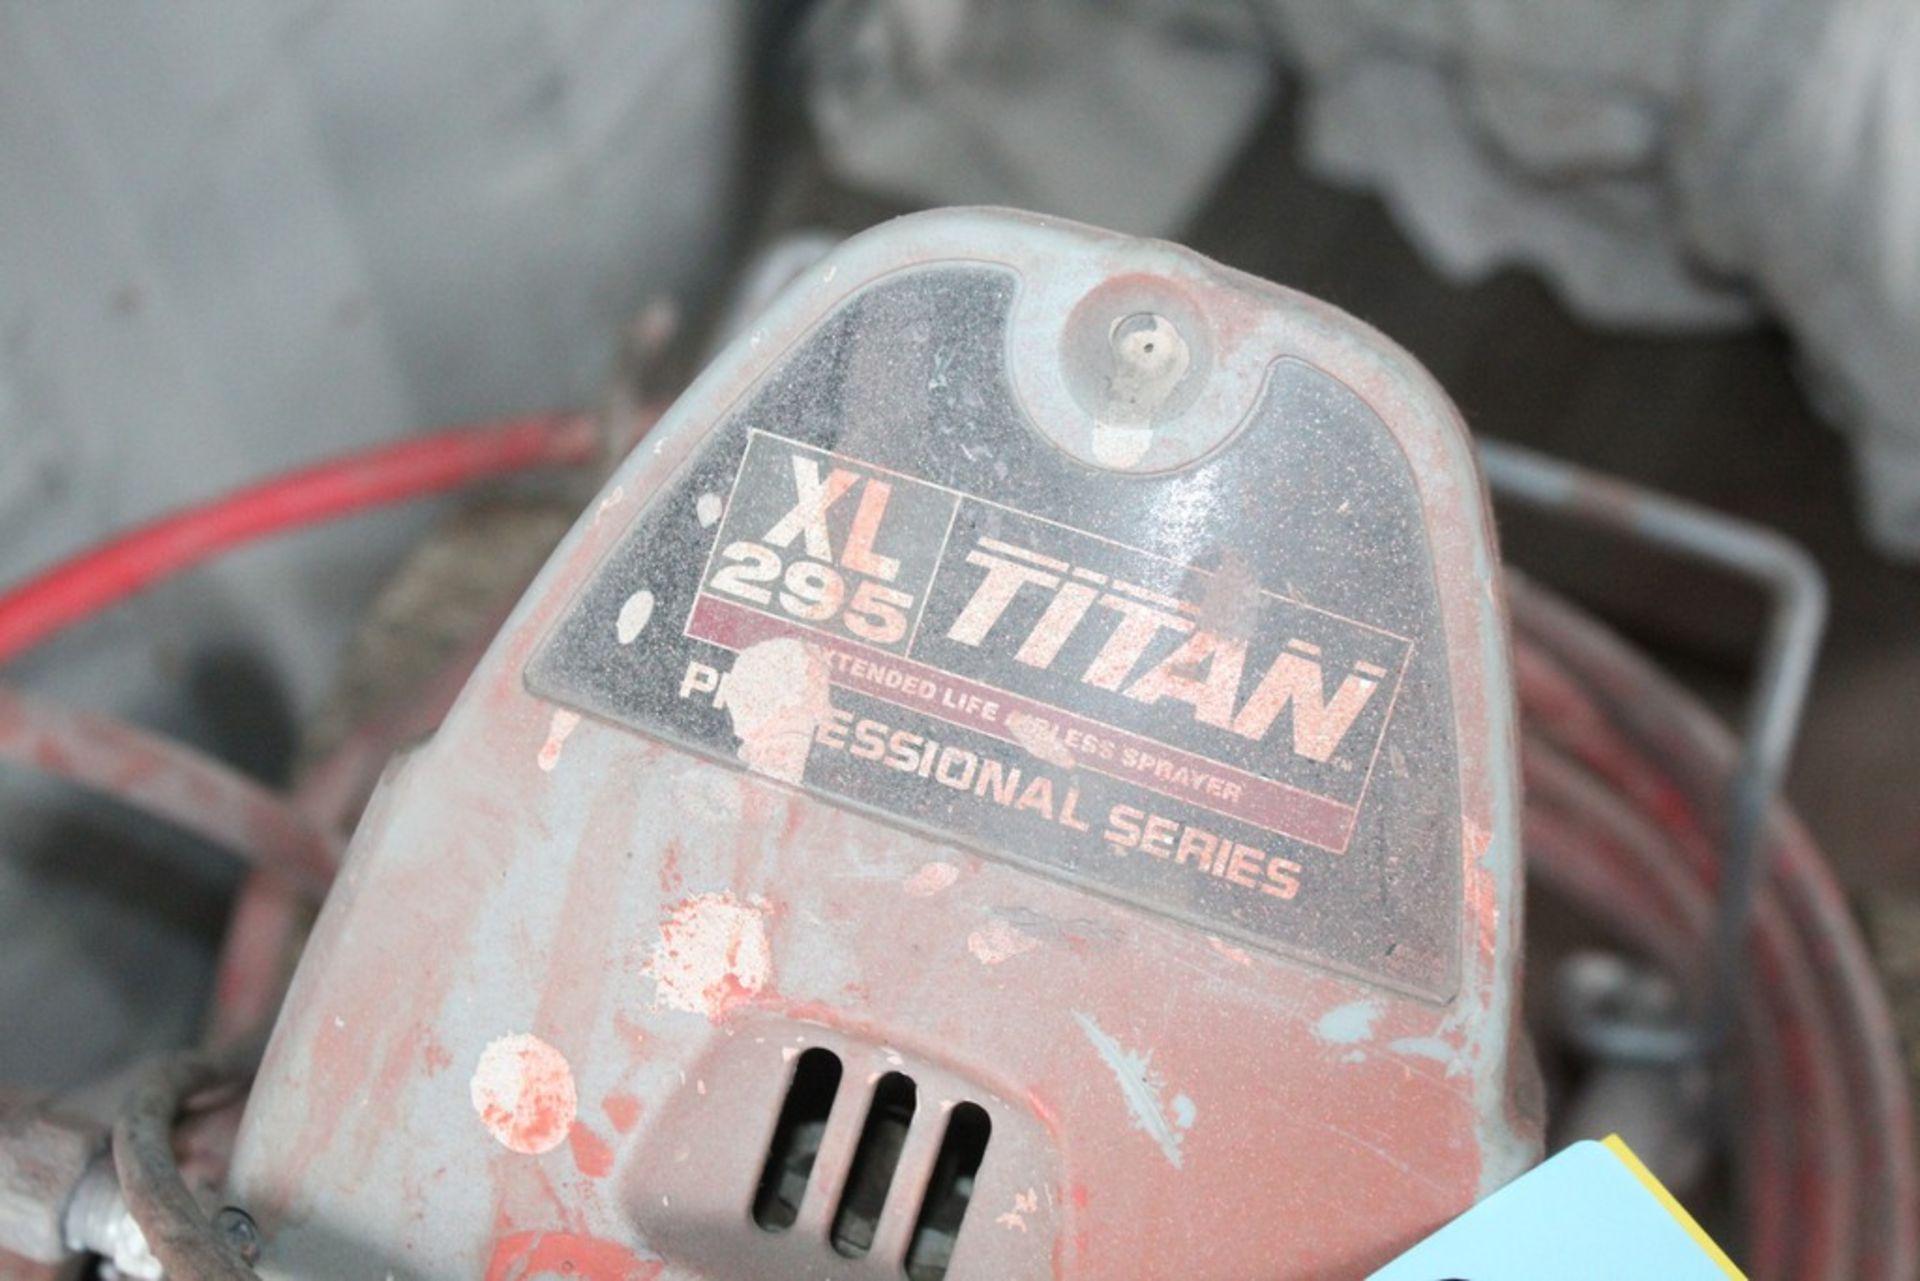 Lot 40 - TITAN XL 295 PROFESSIONAL SERIES AIRLESS PAINT SPRAYER